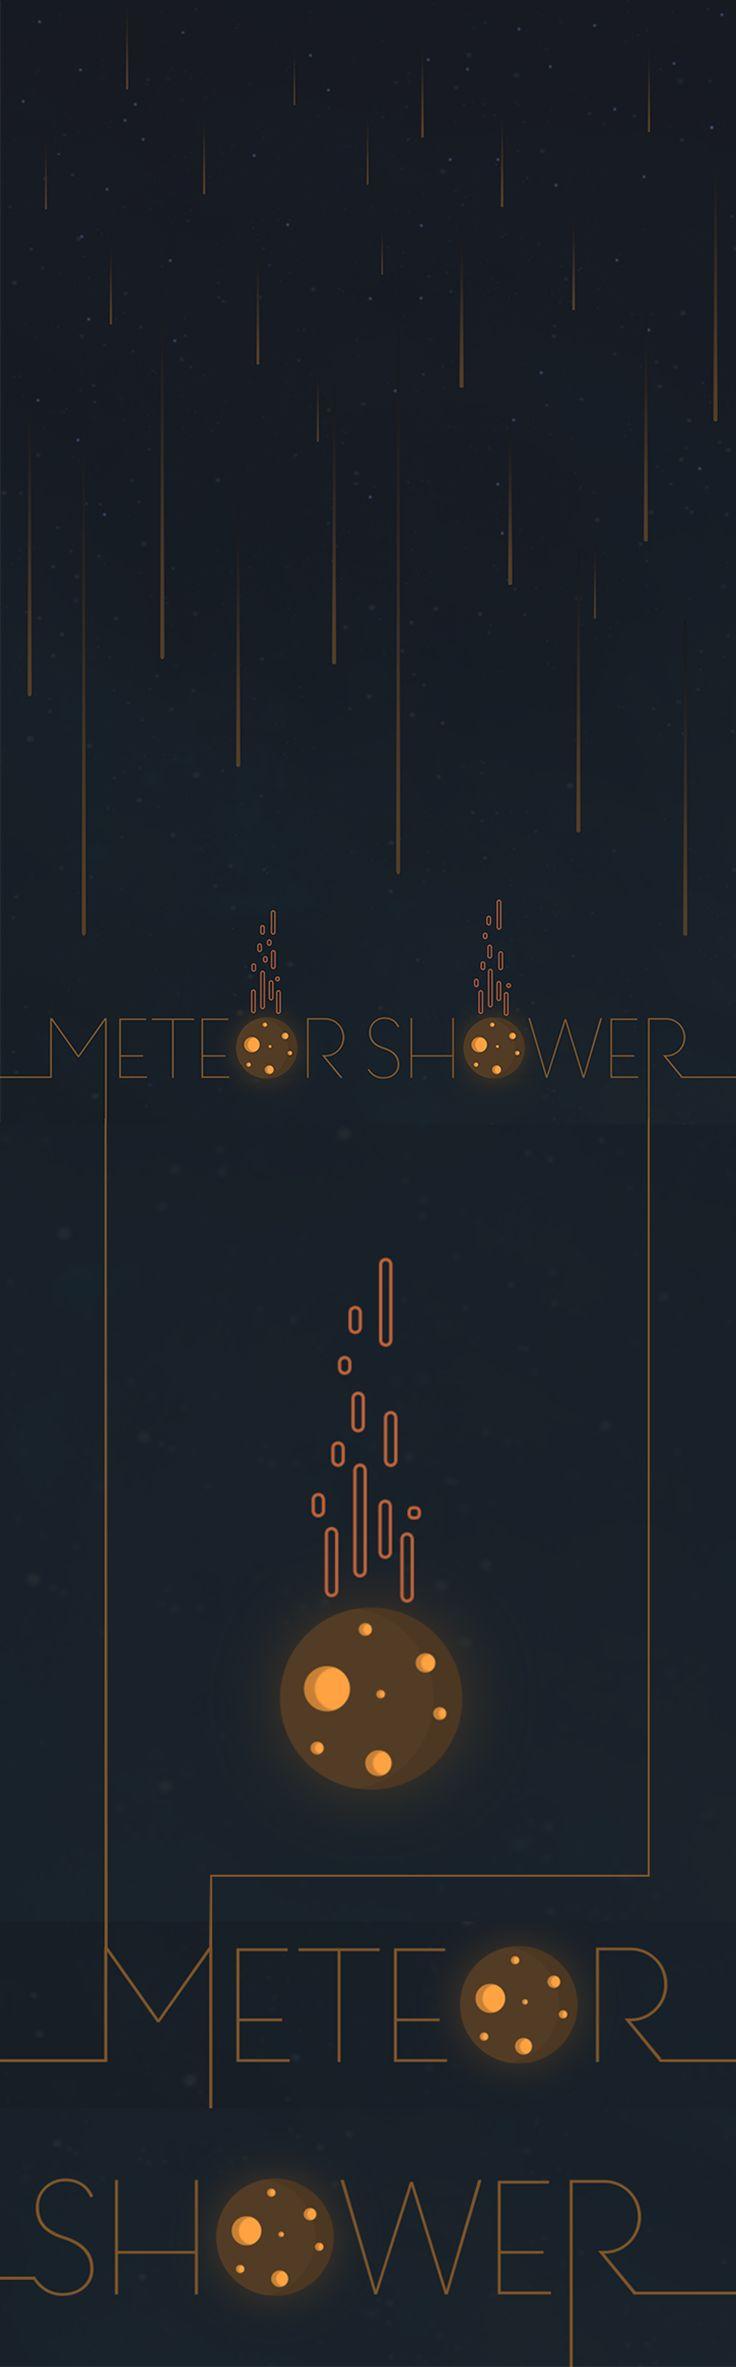 Meteor Shower Illustration